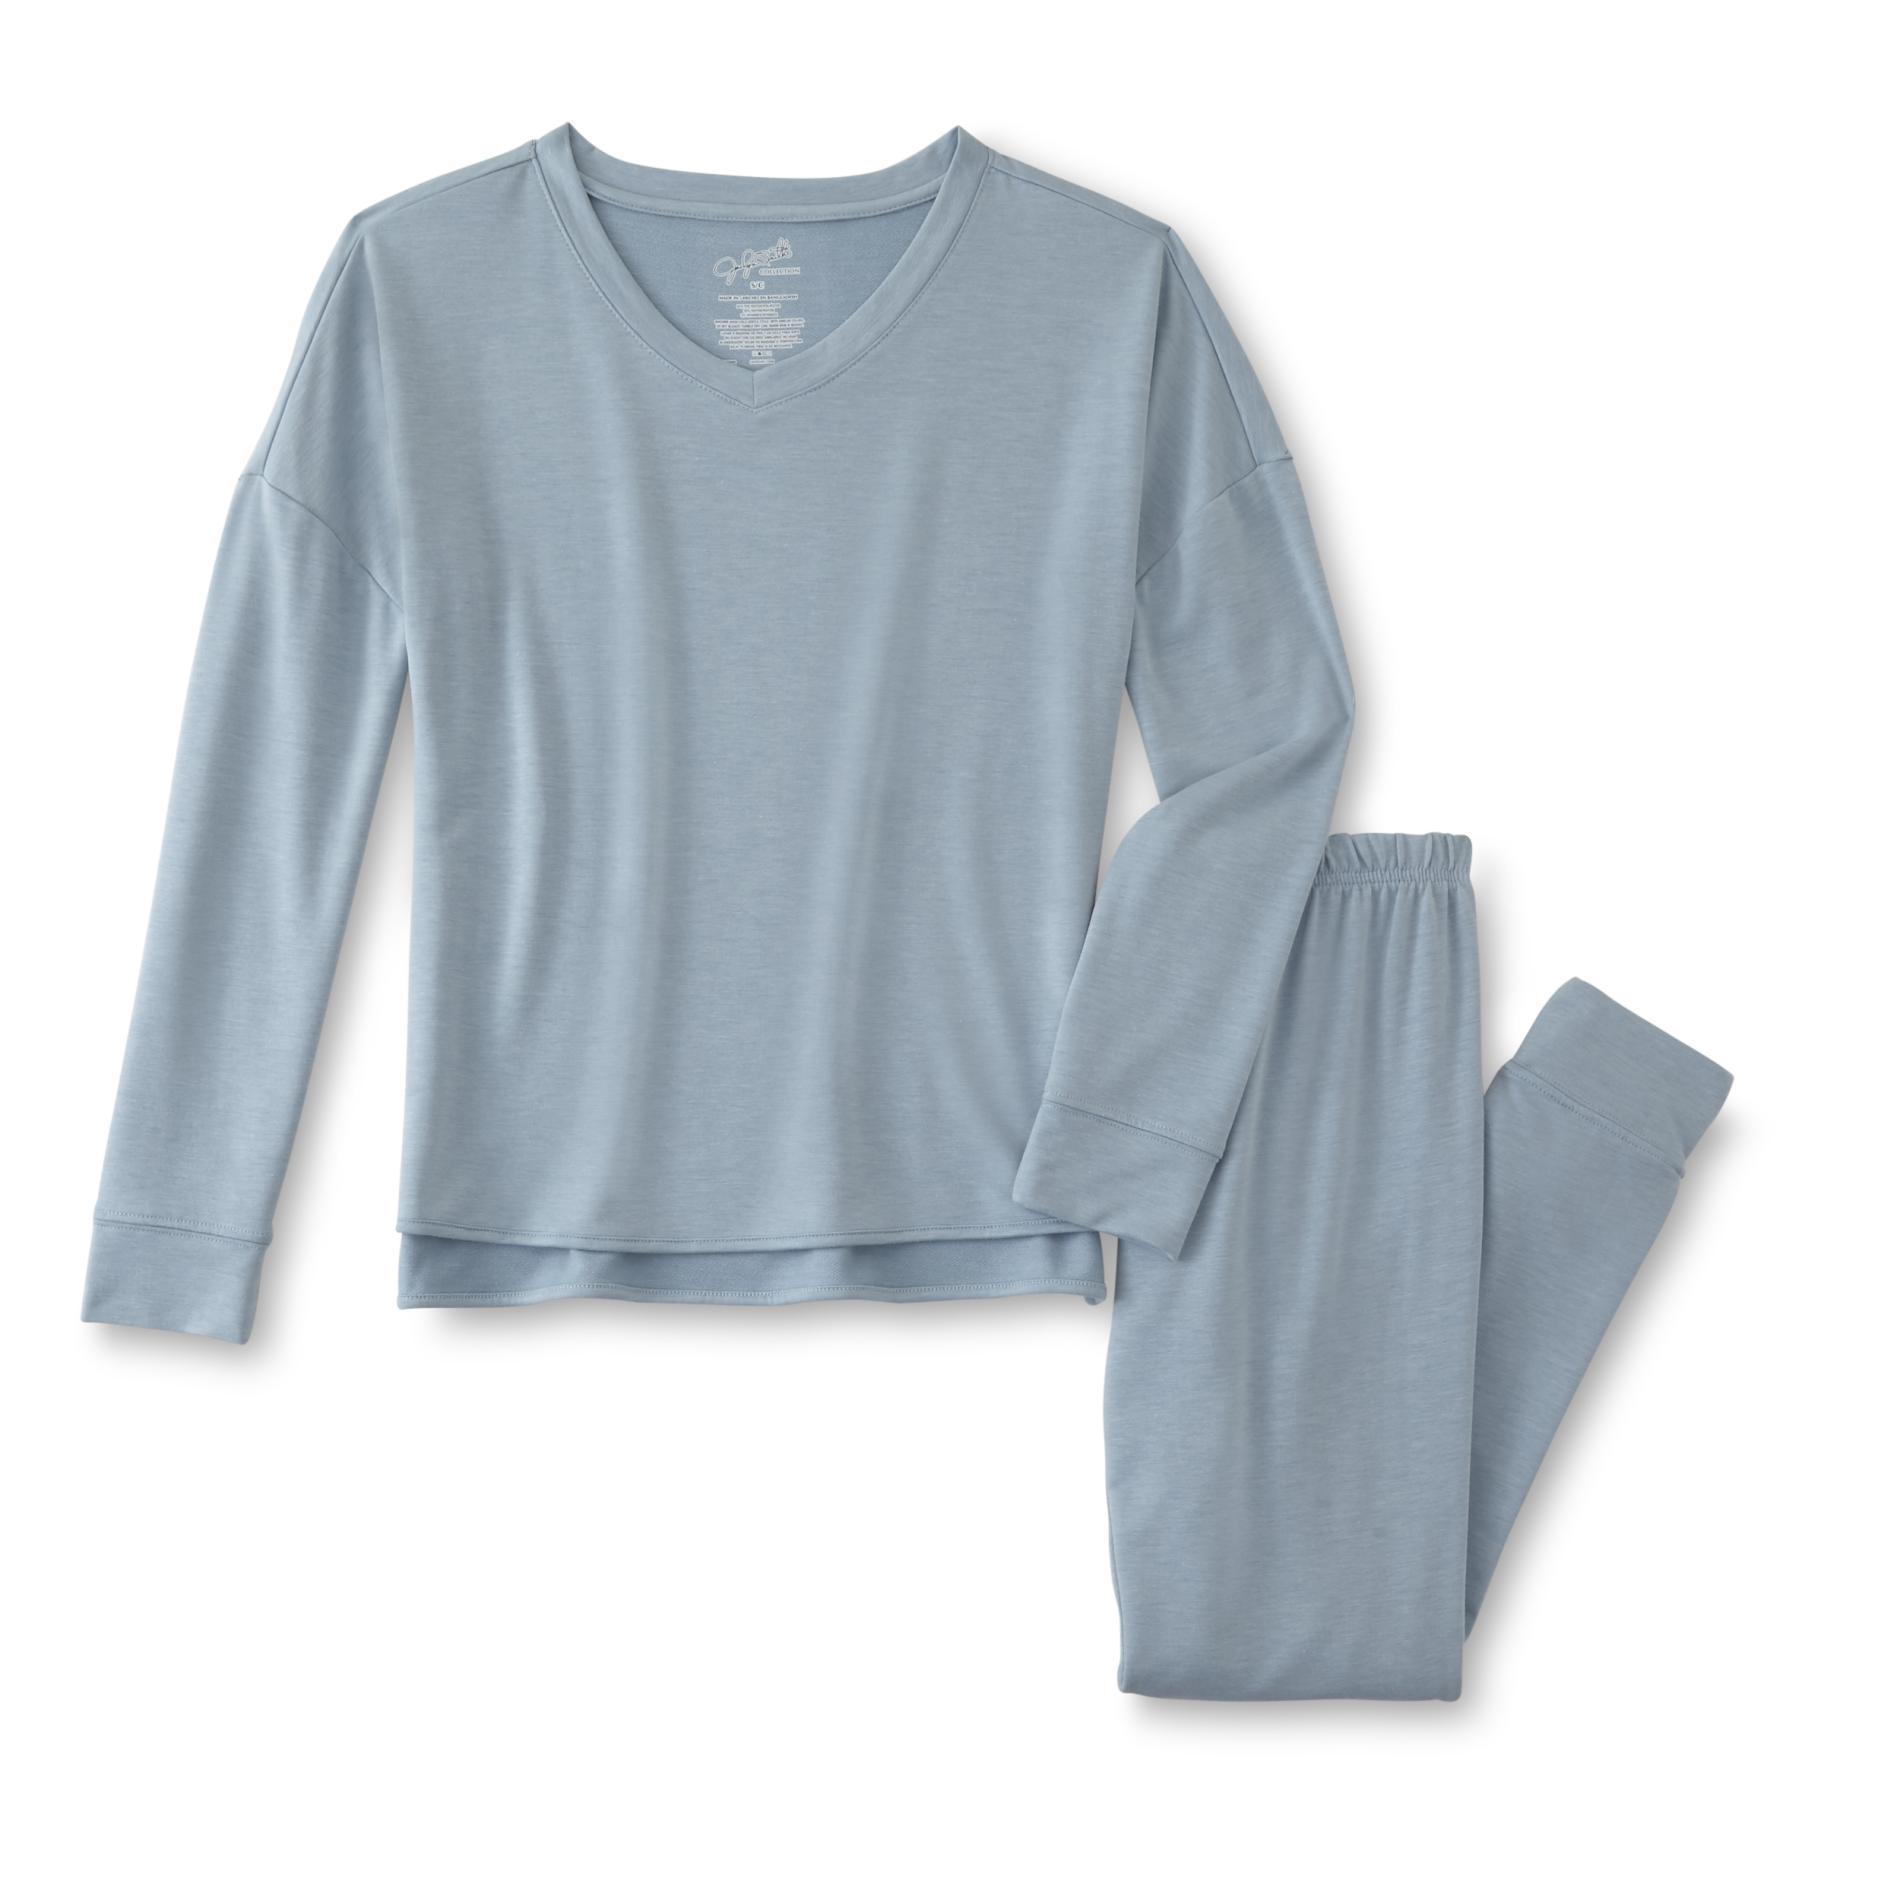 Jaclyn Smith Women's Long-Sleeve Pajama Shirt & Pants, Size: XL, Tourmaline im test